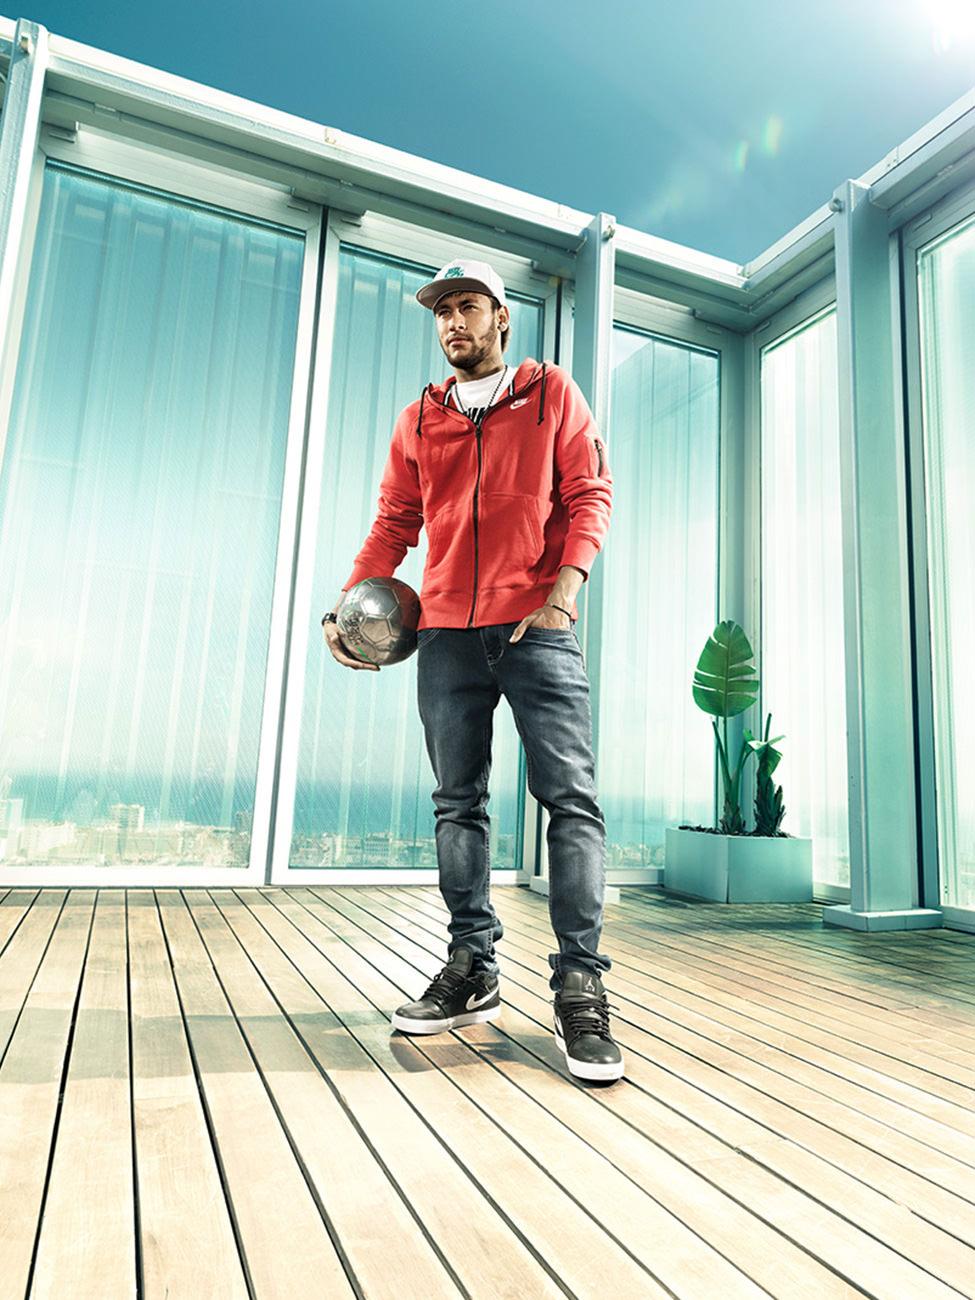 Neymar Jr, klab, anke luckmann, www.ankeluckmann.com, advertising, portrait, football, neymar, fantastic eleven